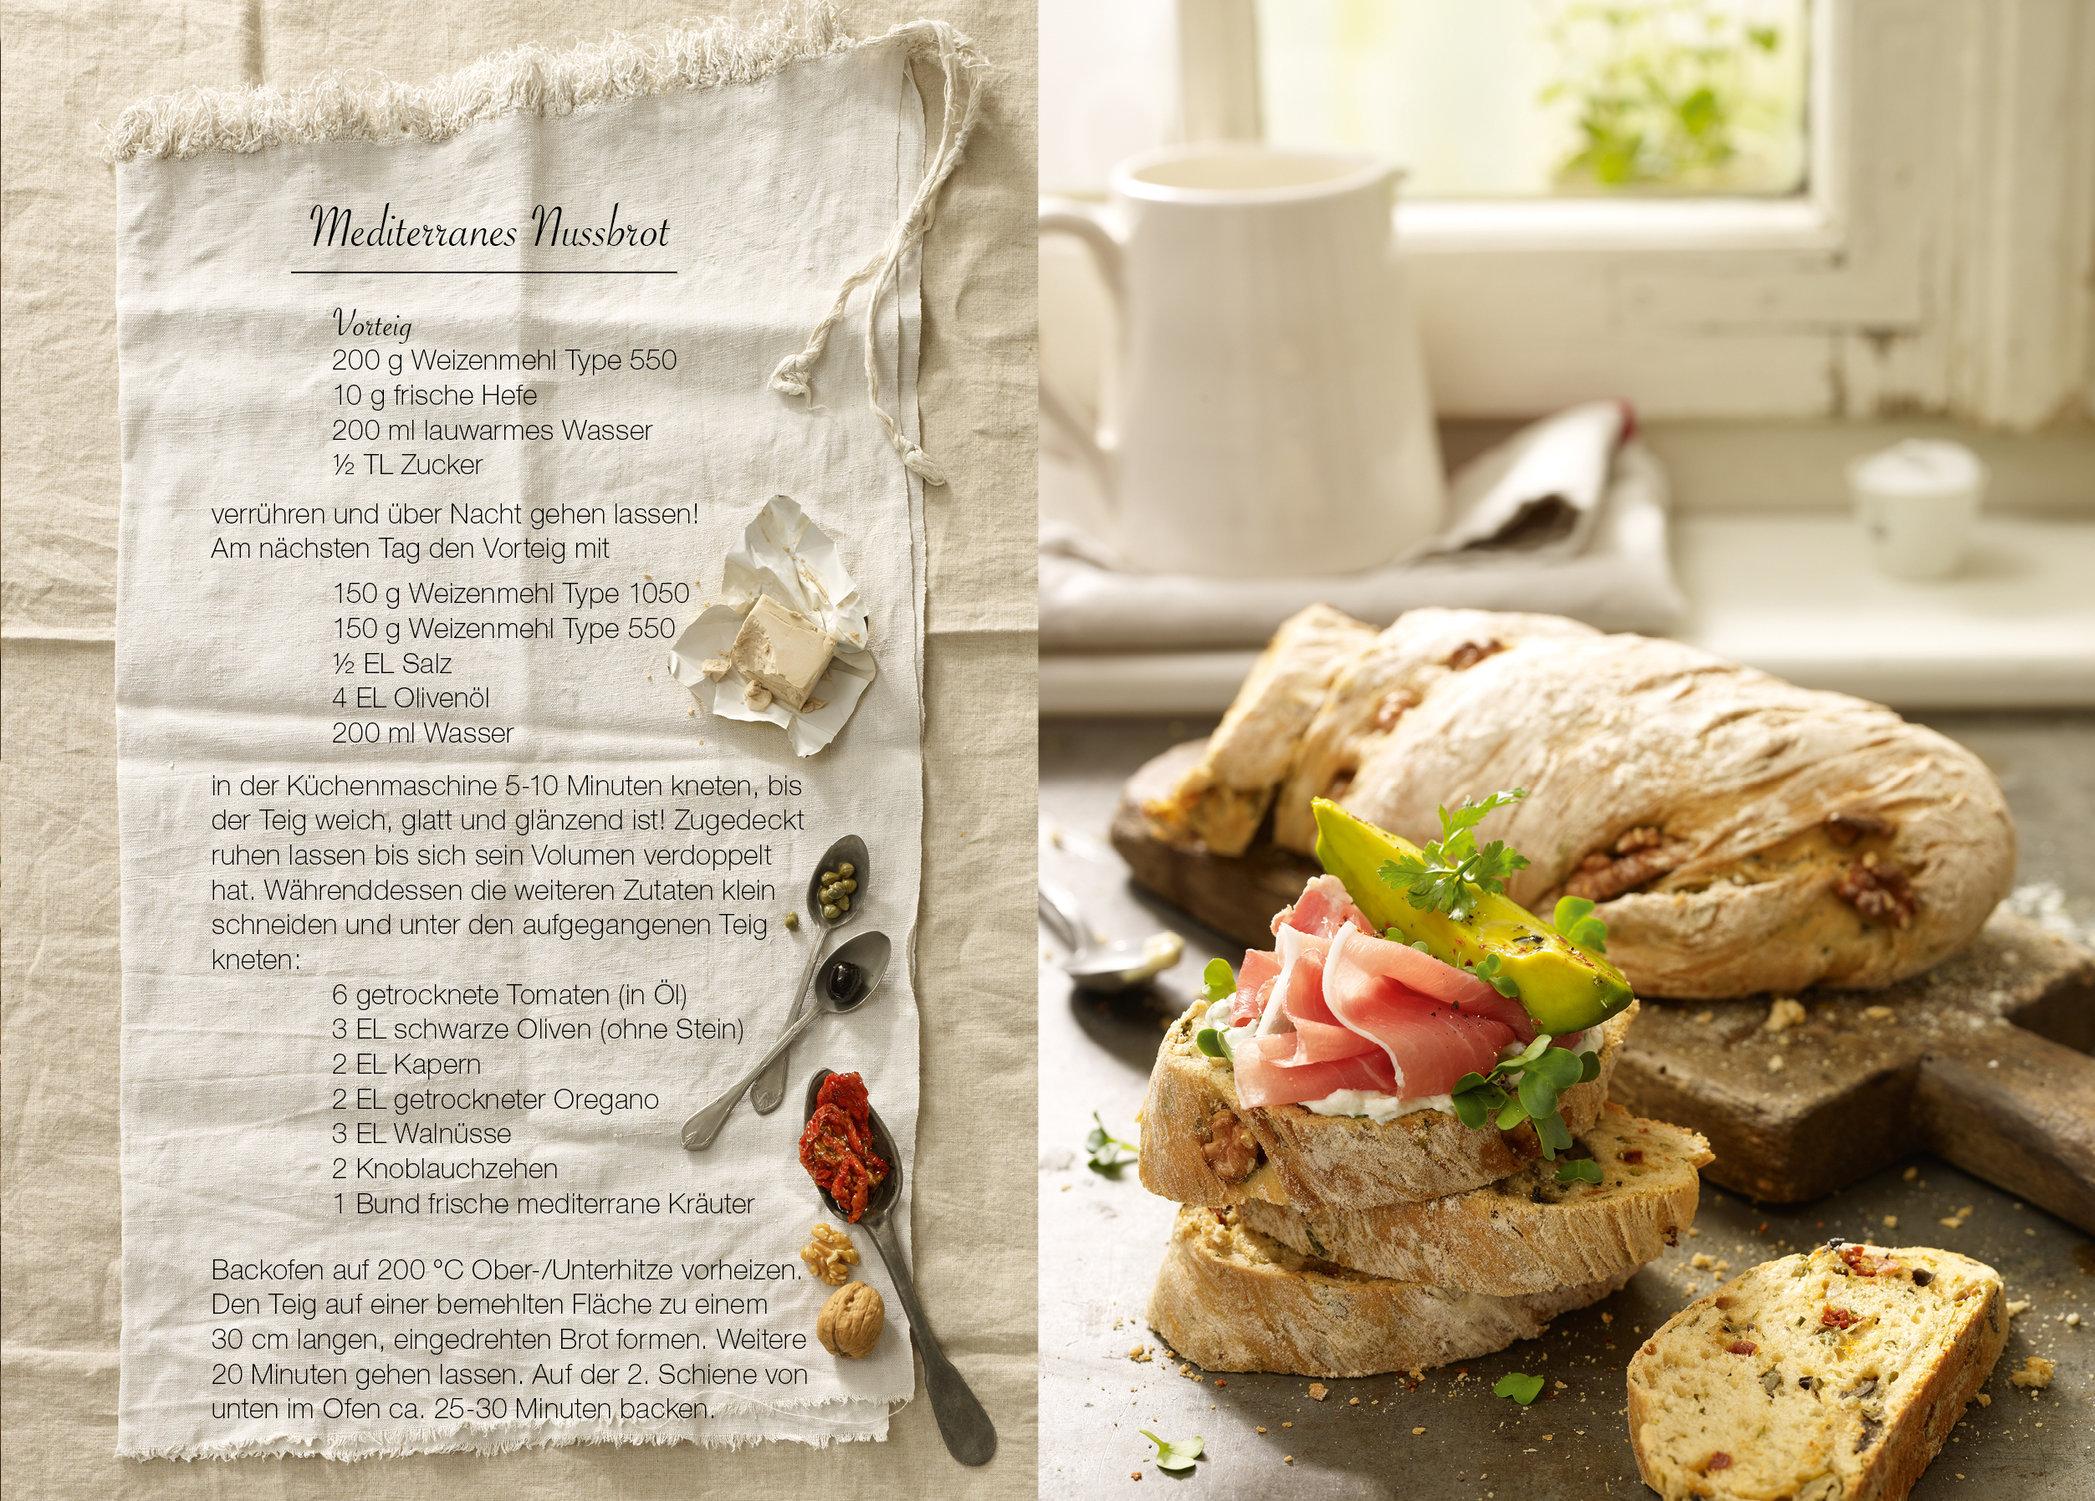 Brot backen - Personal Work